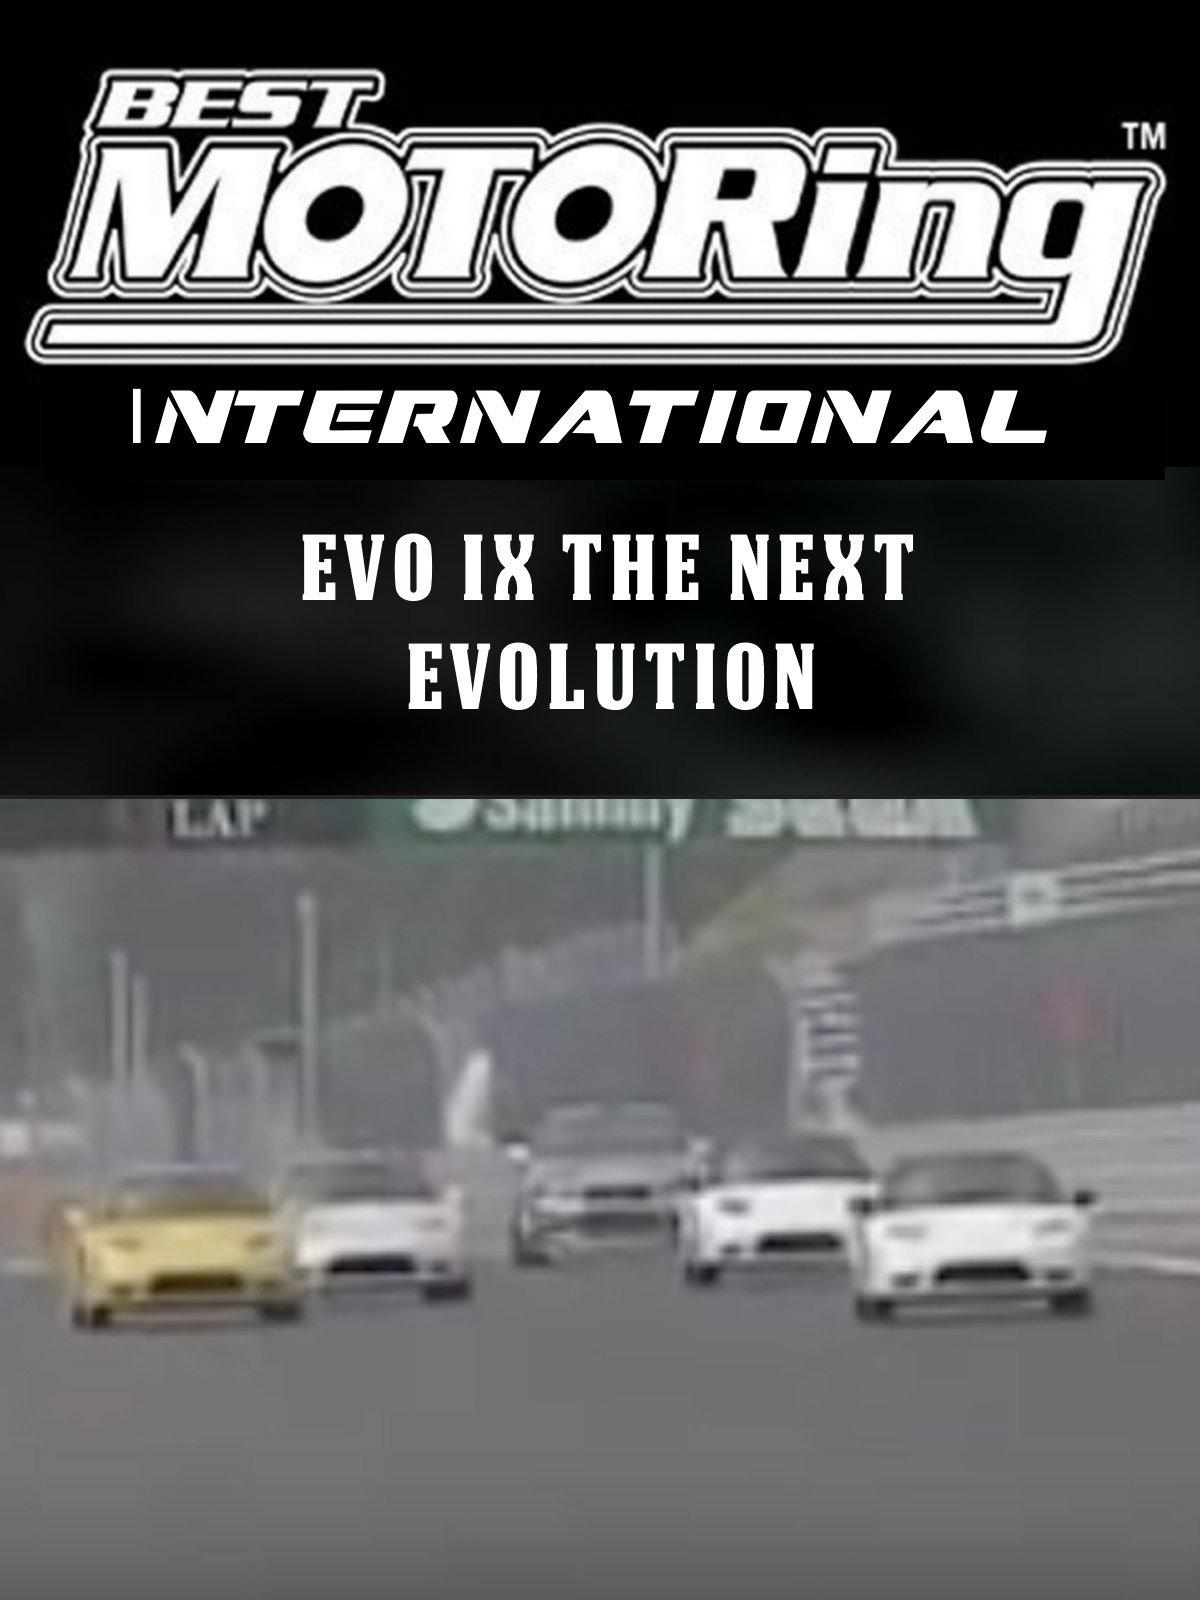 Best Motoring International Evo IX The Next Evolution